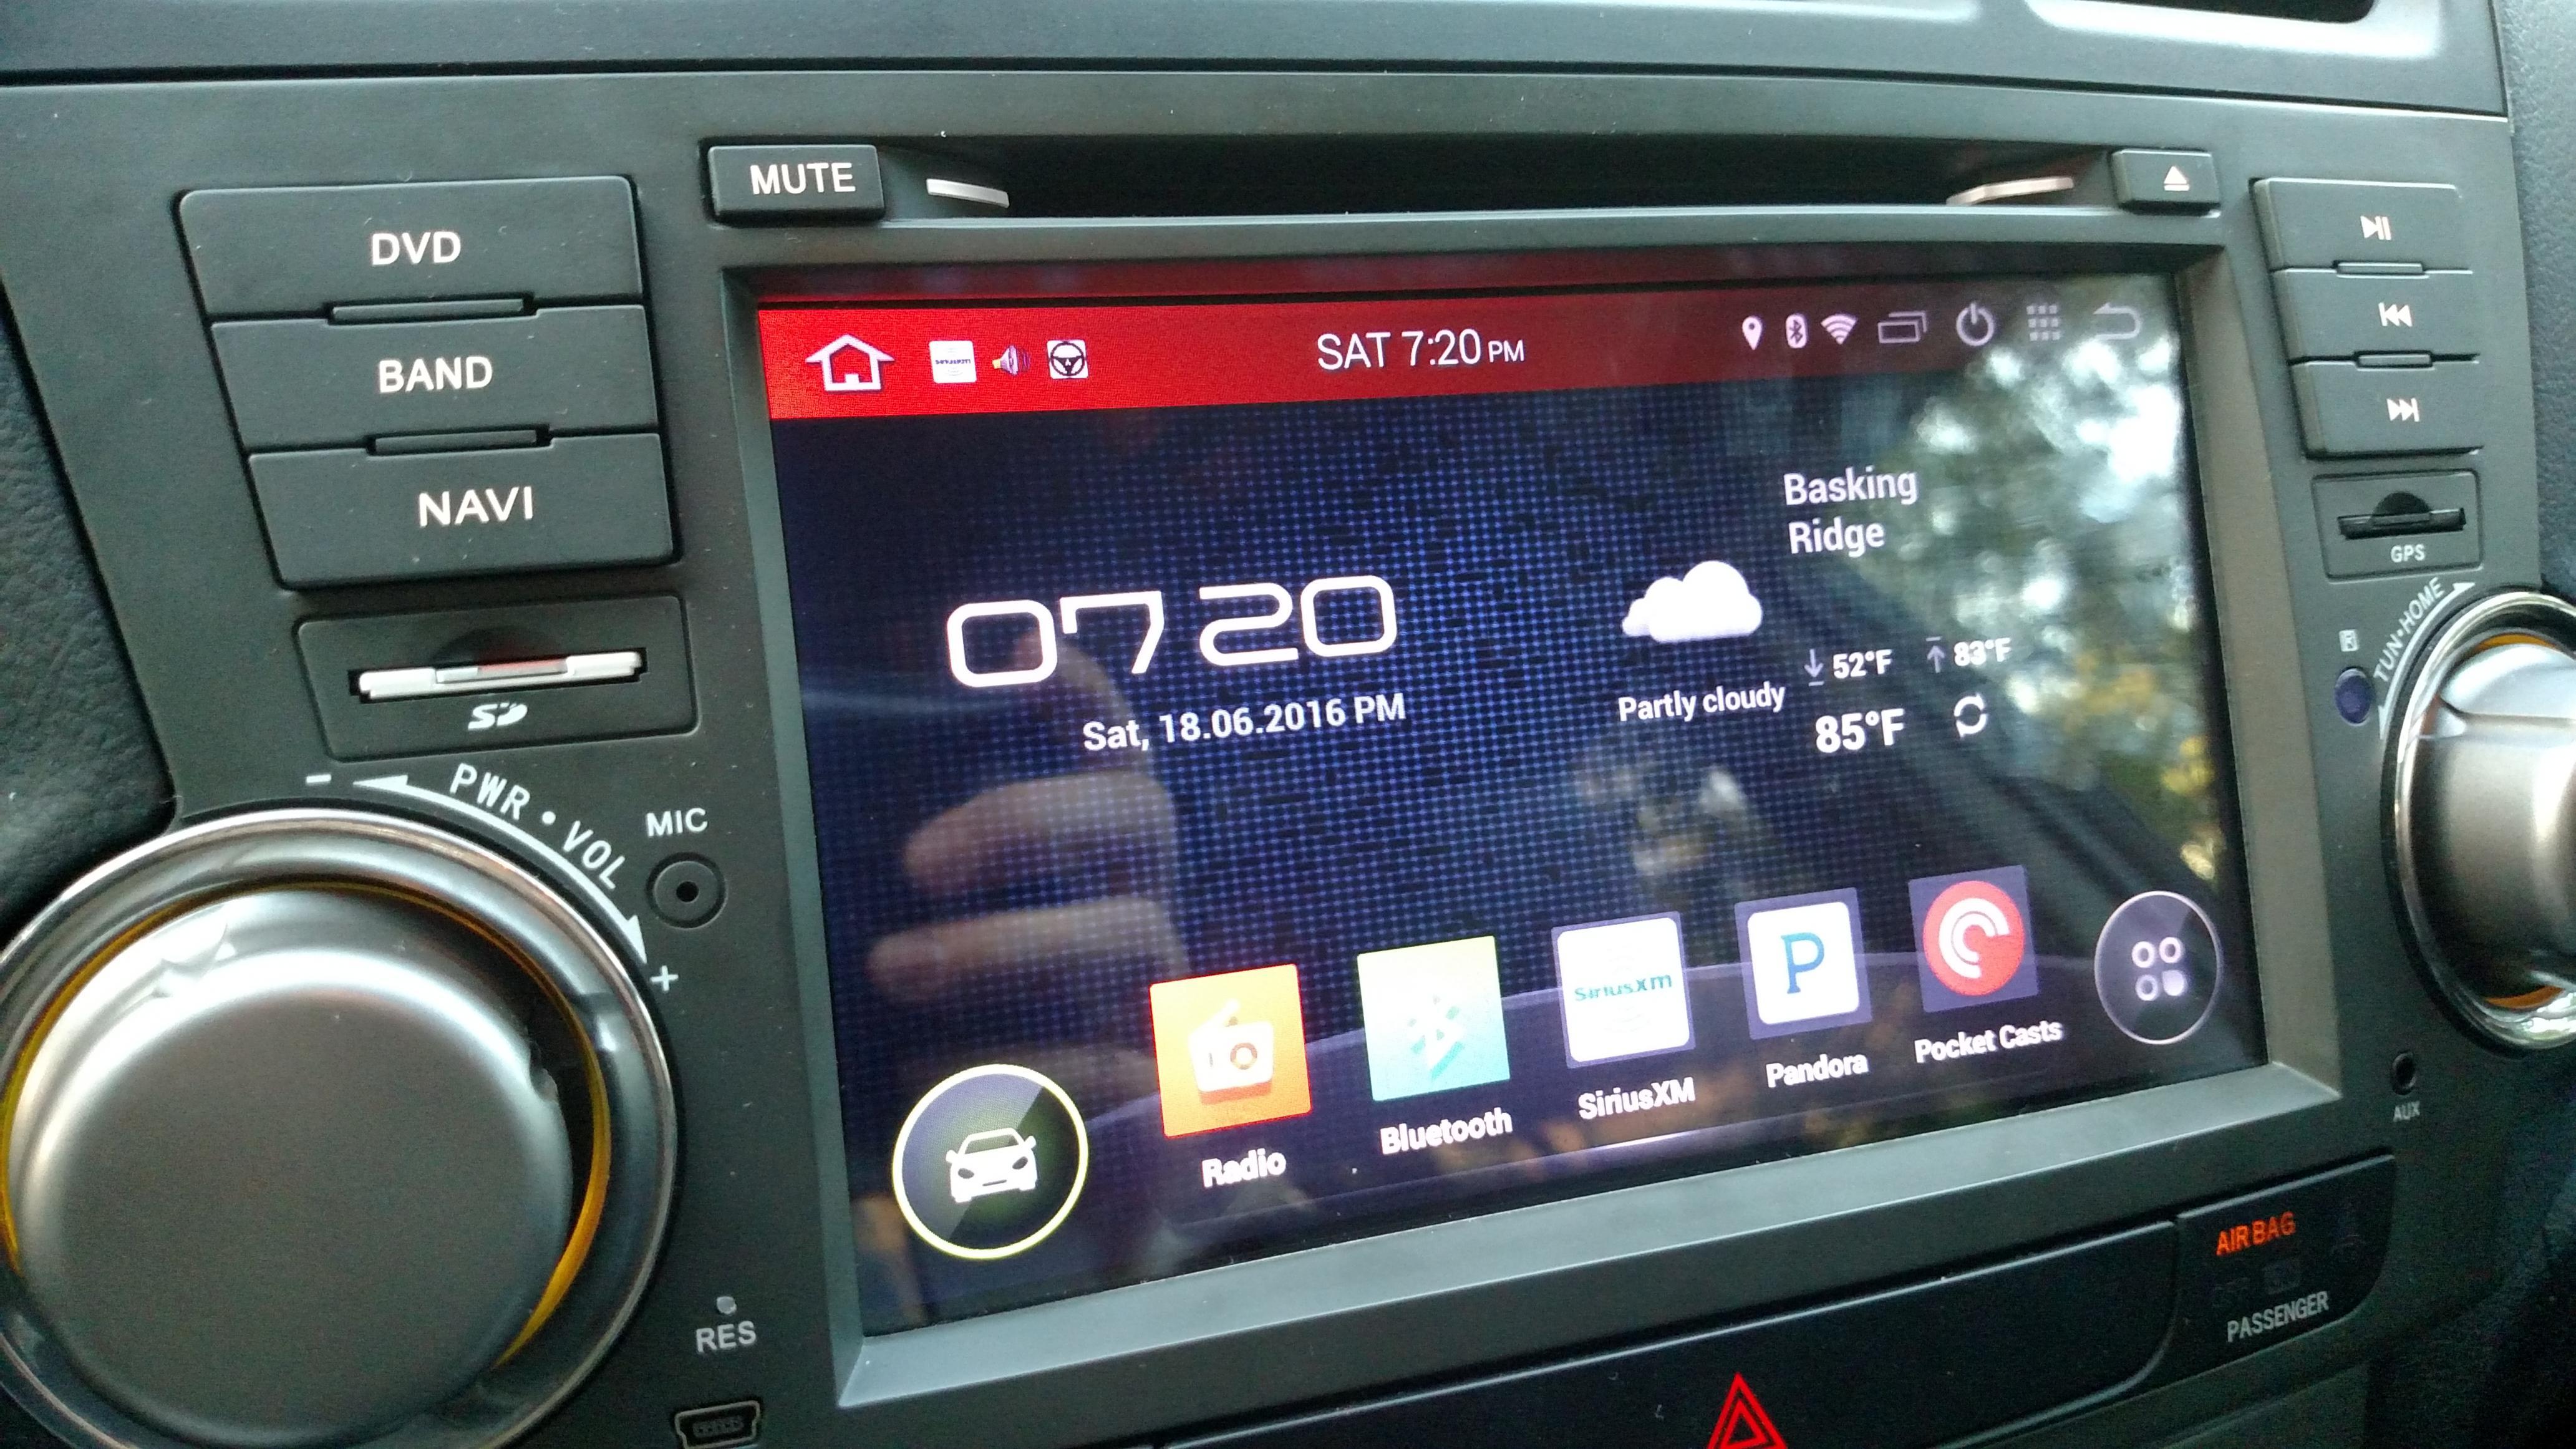 OEM fit Android Head Unit Radio DVD Navigation upgrade installation